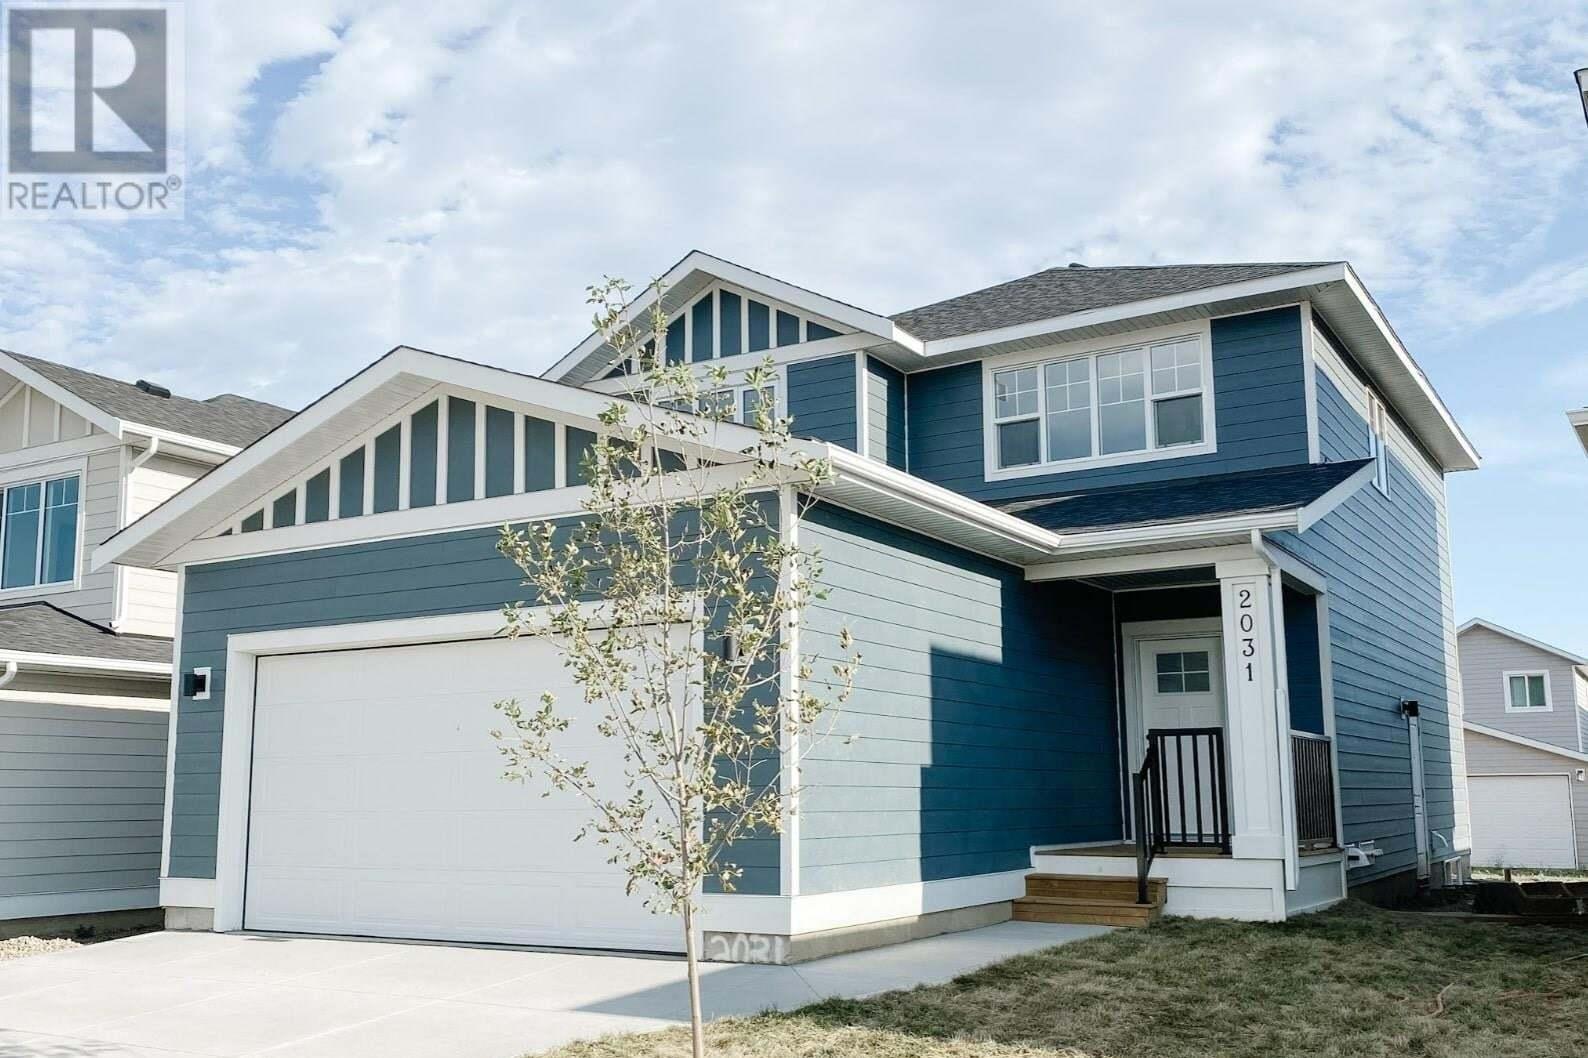 House for sale at 2031 Stilling Ln Saskatoon Saskatchewan - MLS: SK821132